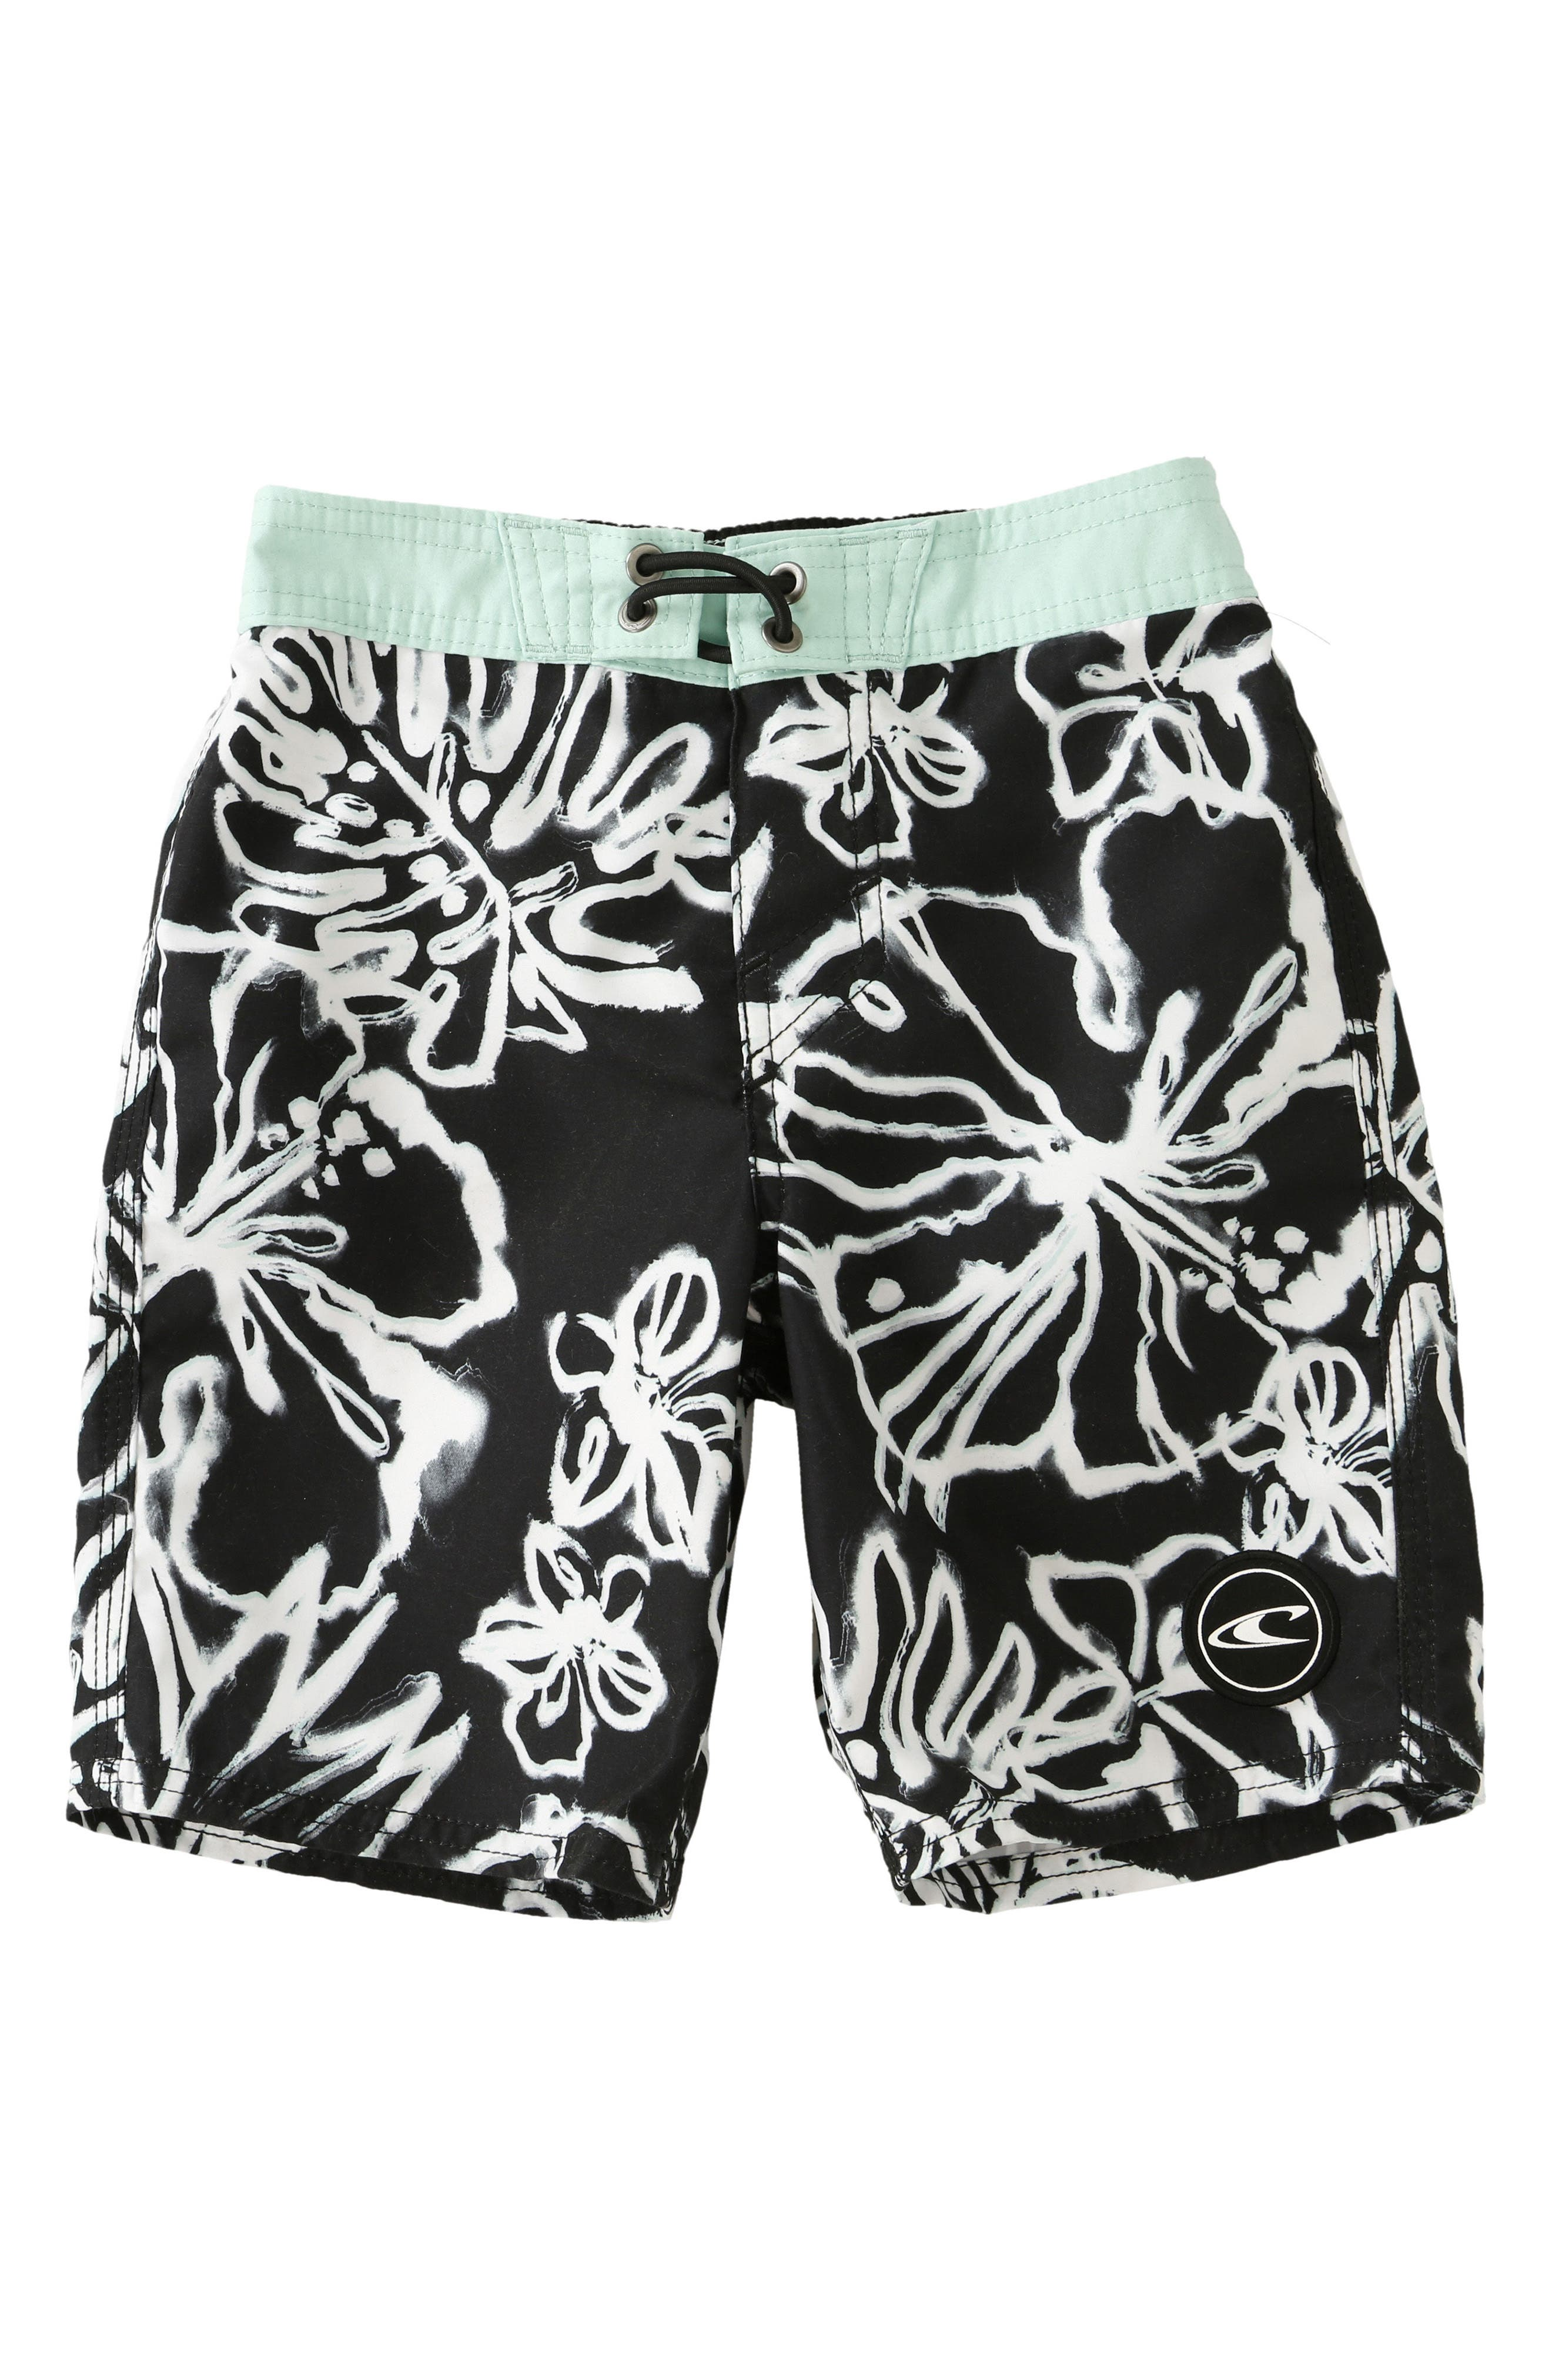 Hanalei Board Shorts,                         Main,                         color, Black